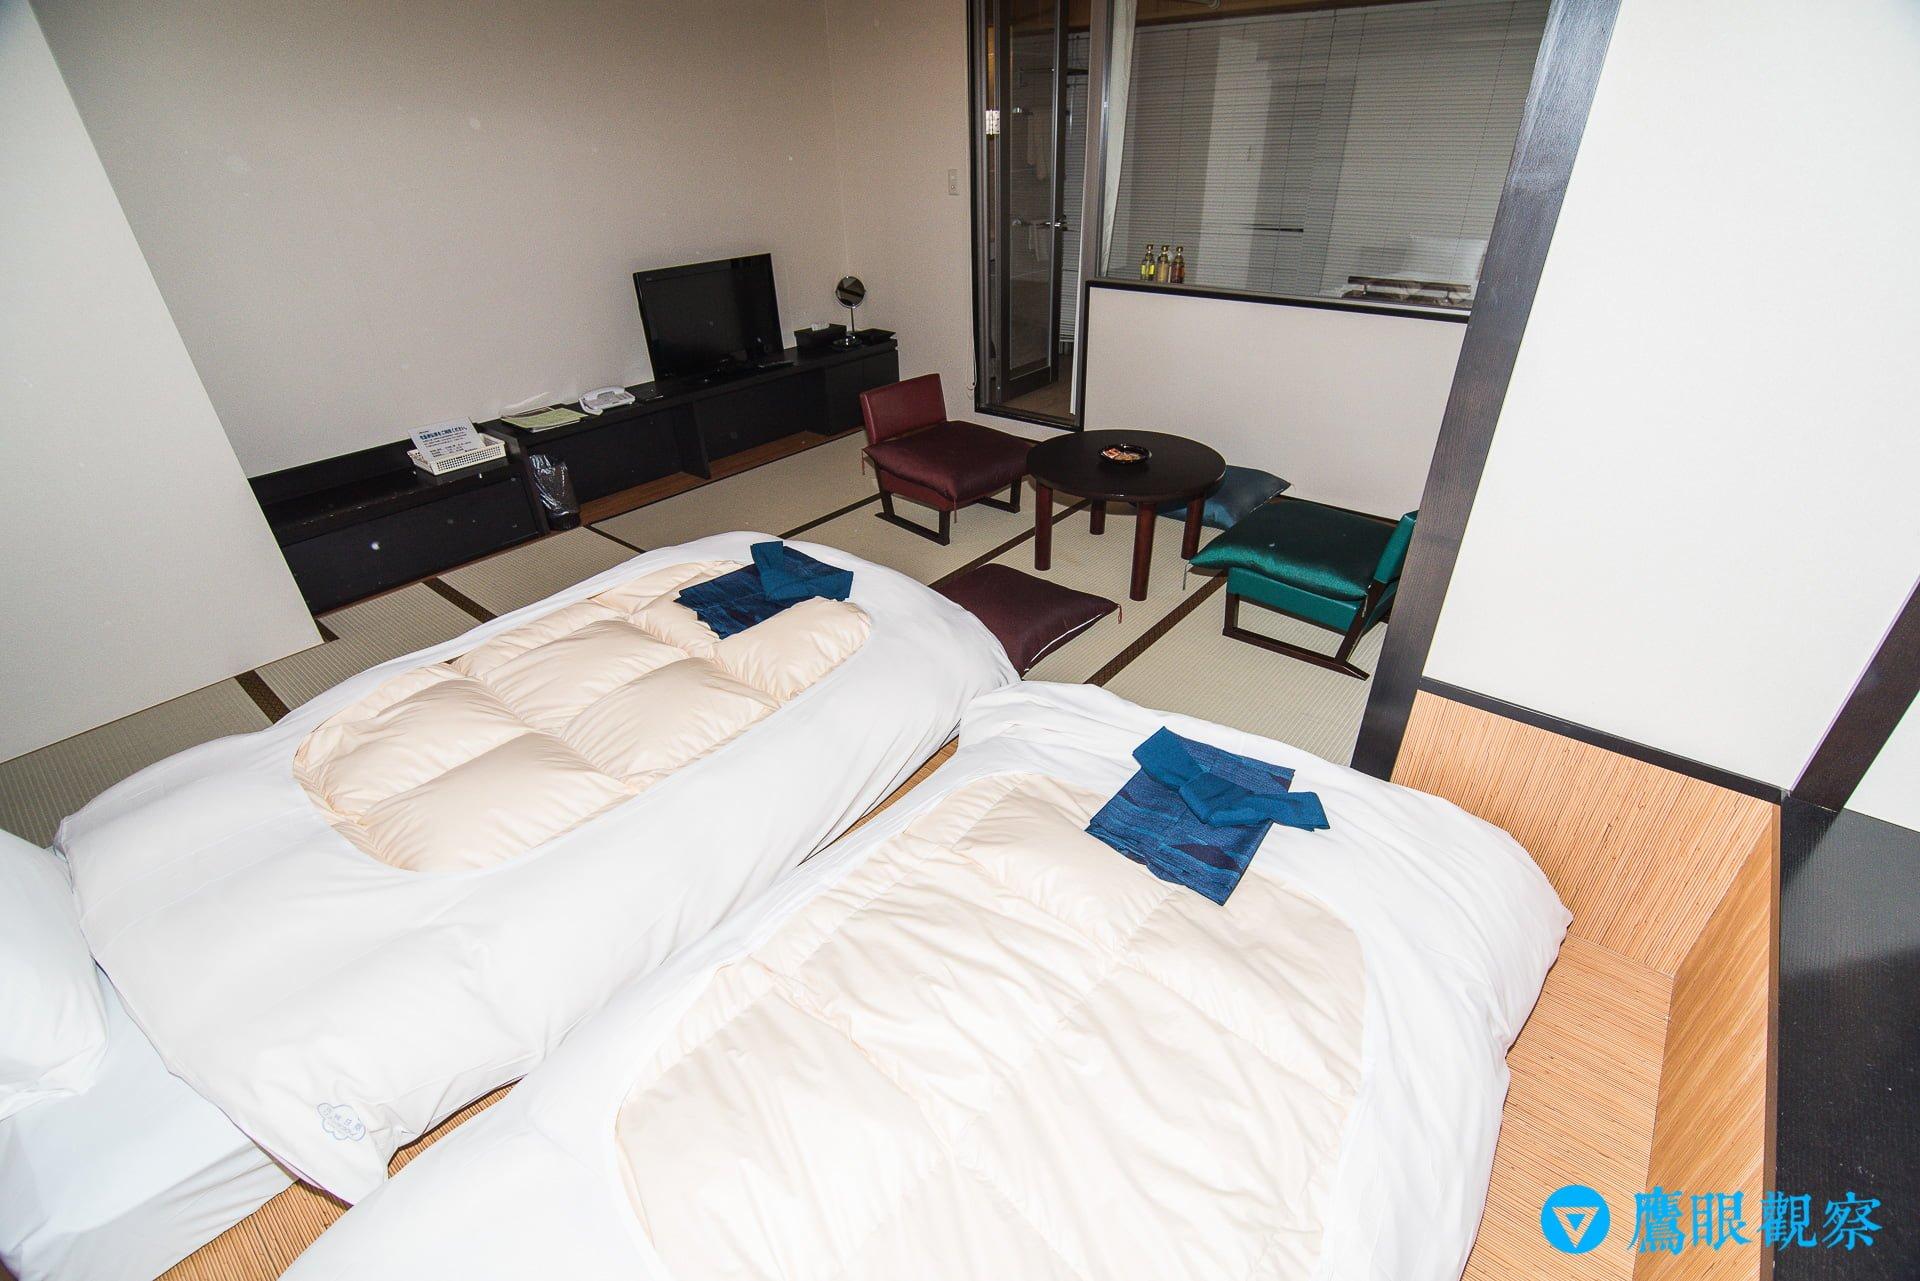 Travel Oarai Hotel in Ibaraki Prefecture Japan 59 日本茨城縣/東茨城/大洗飯店(大洗ホテル)/旅館推薦與住宿旅遊心得分享